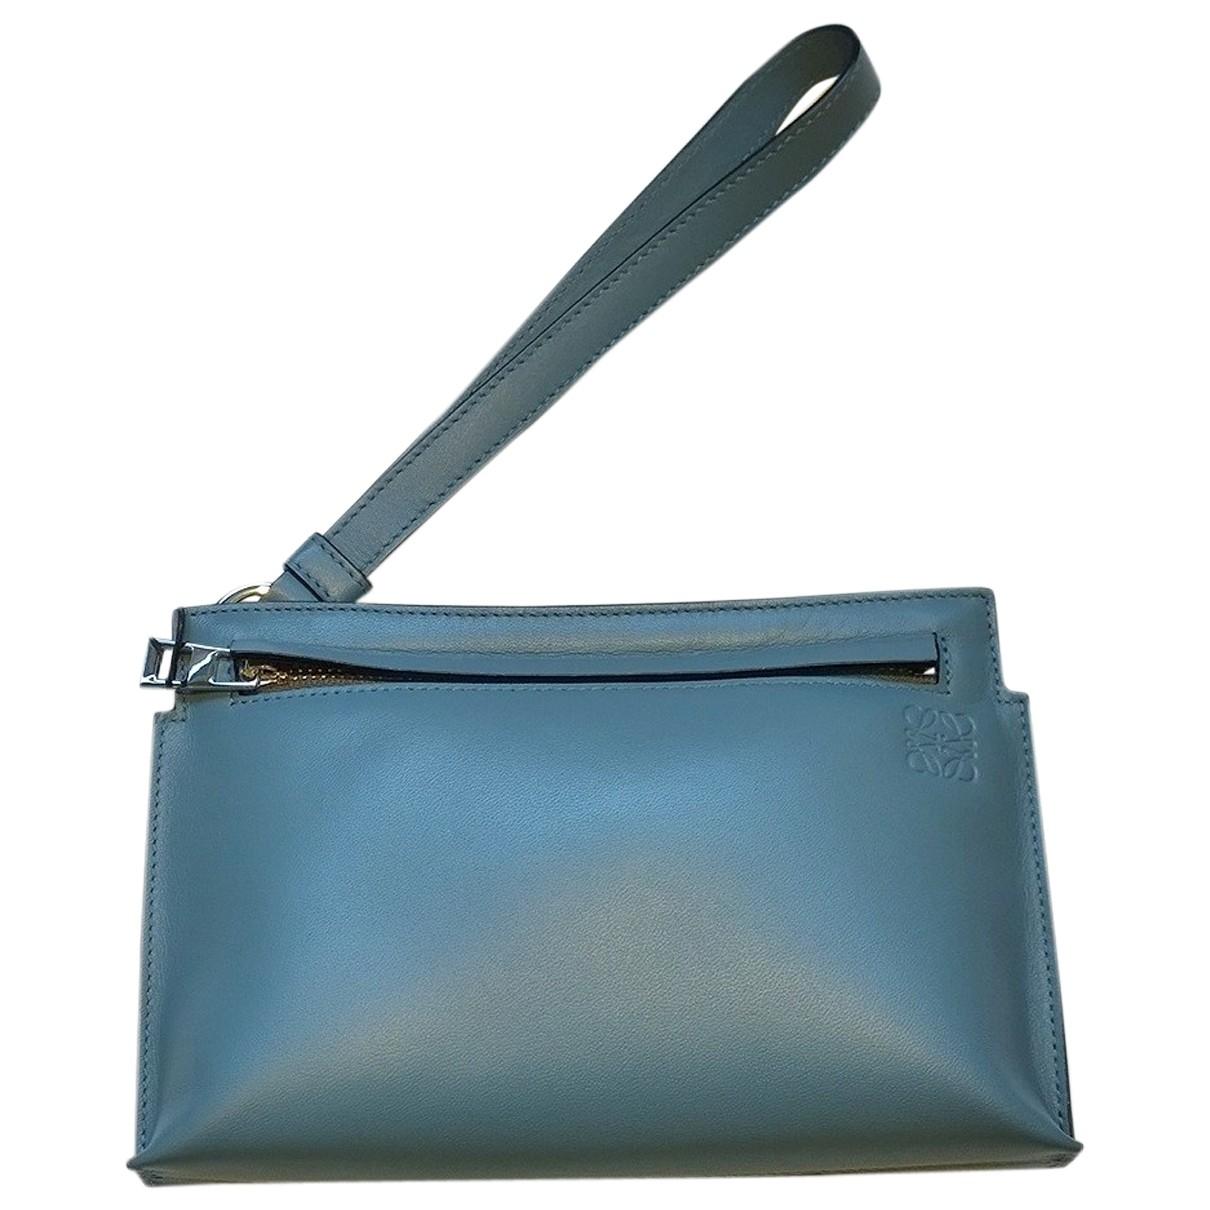 Loewe - Petite maroquinerie   pour femme en cuir - bleu